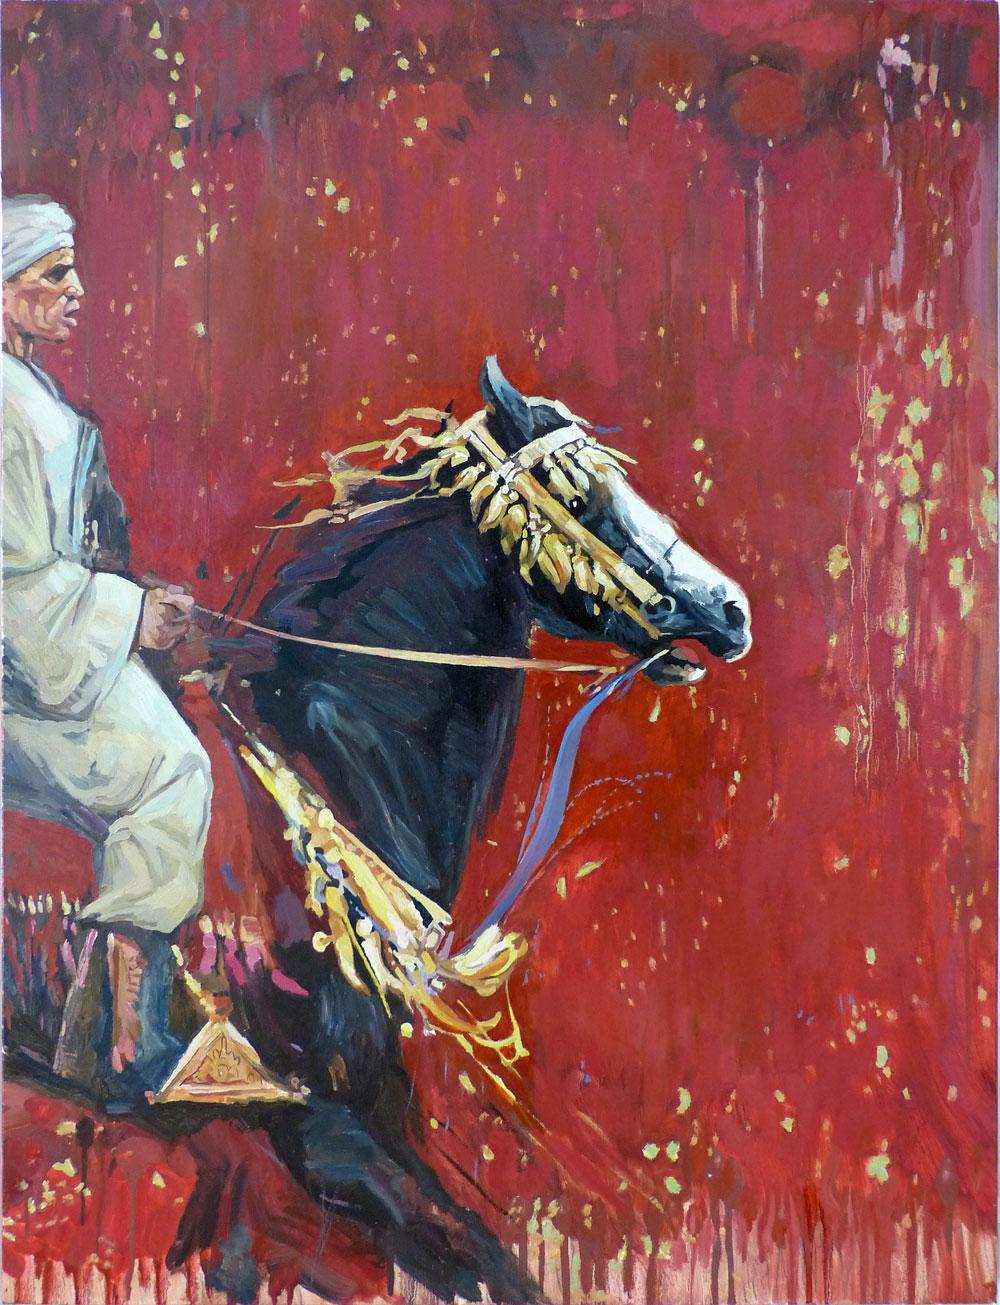 Le-Chevalier-arabe-et-son-pur-sang_Oleg-Petounine_2005